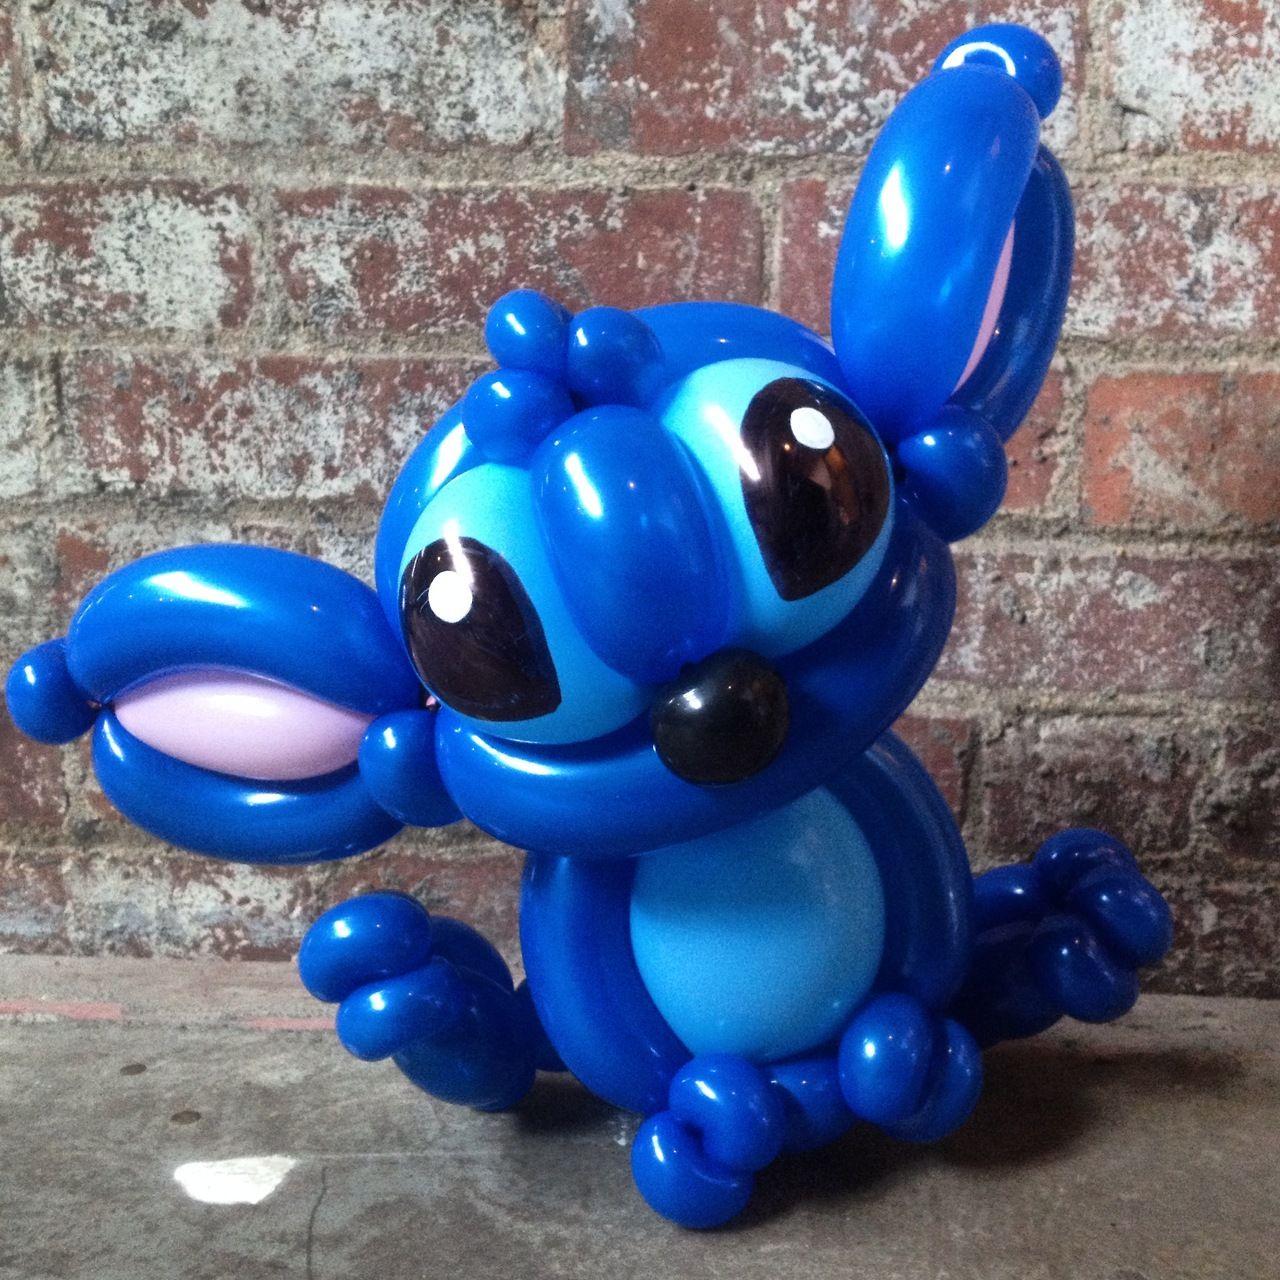 Day 233: #Stitch (aka. Experiment 626) #LiloandStitch #BalloonAnimals #Disney